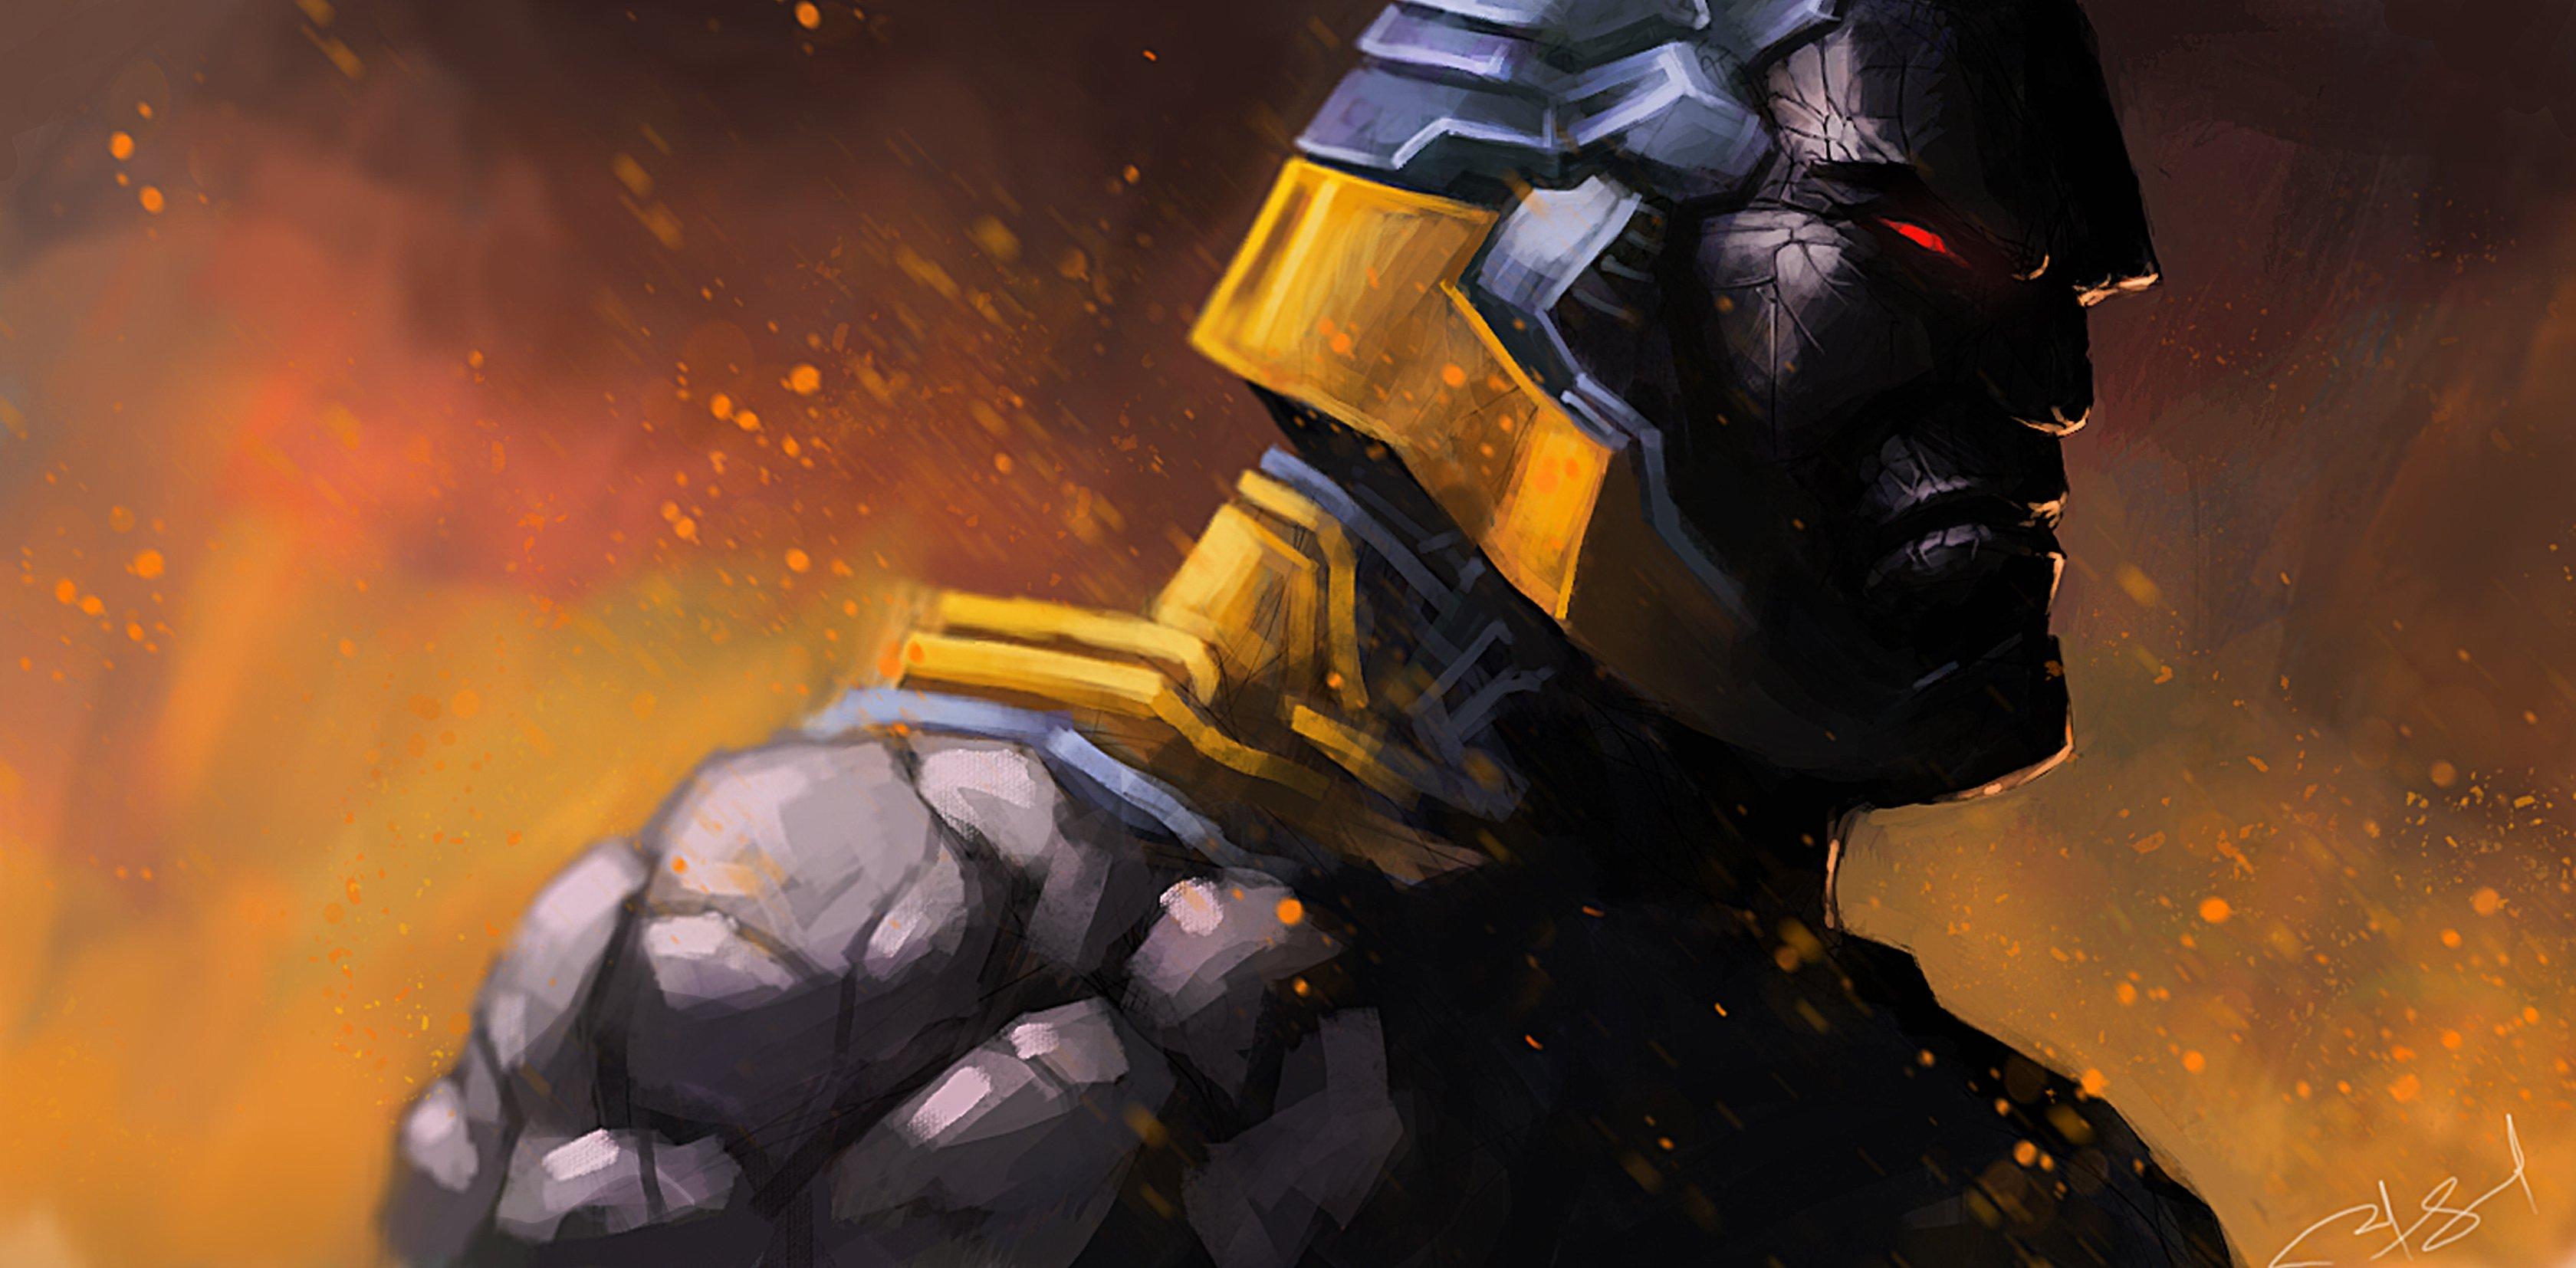 Fondos de pantalla Darkseid